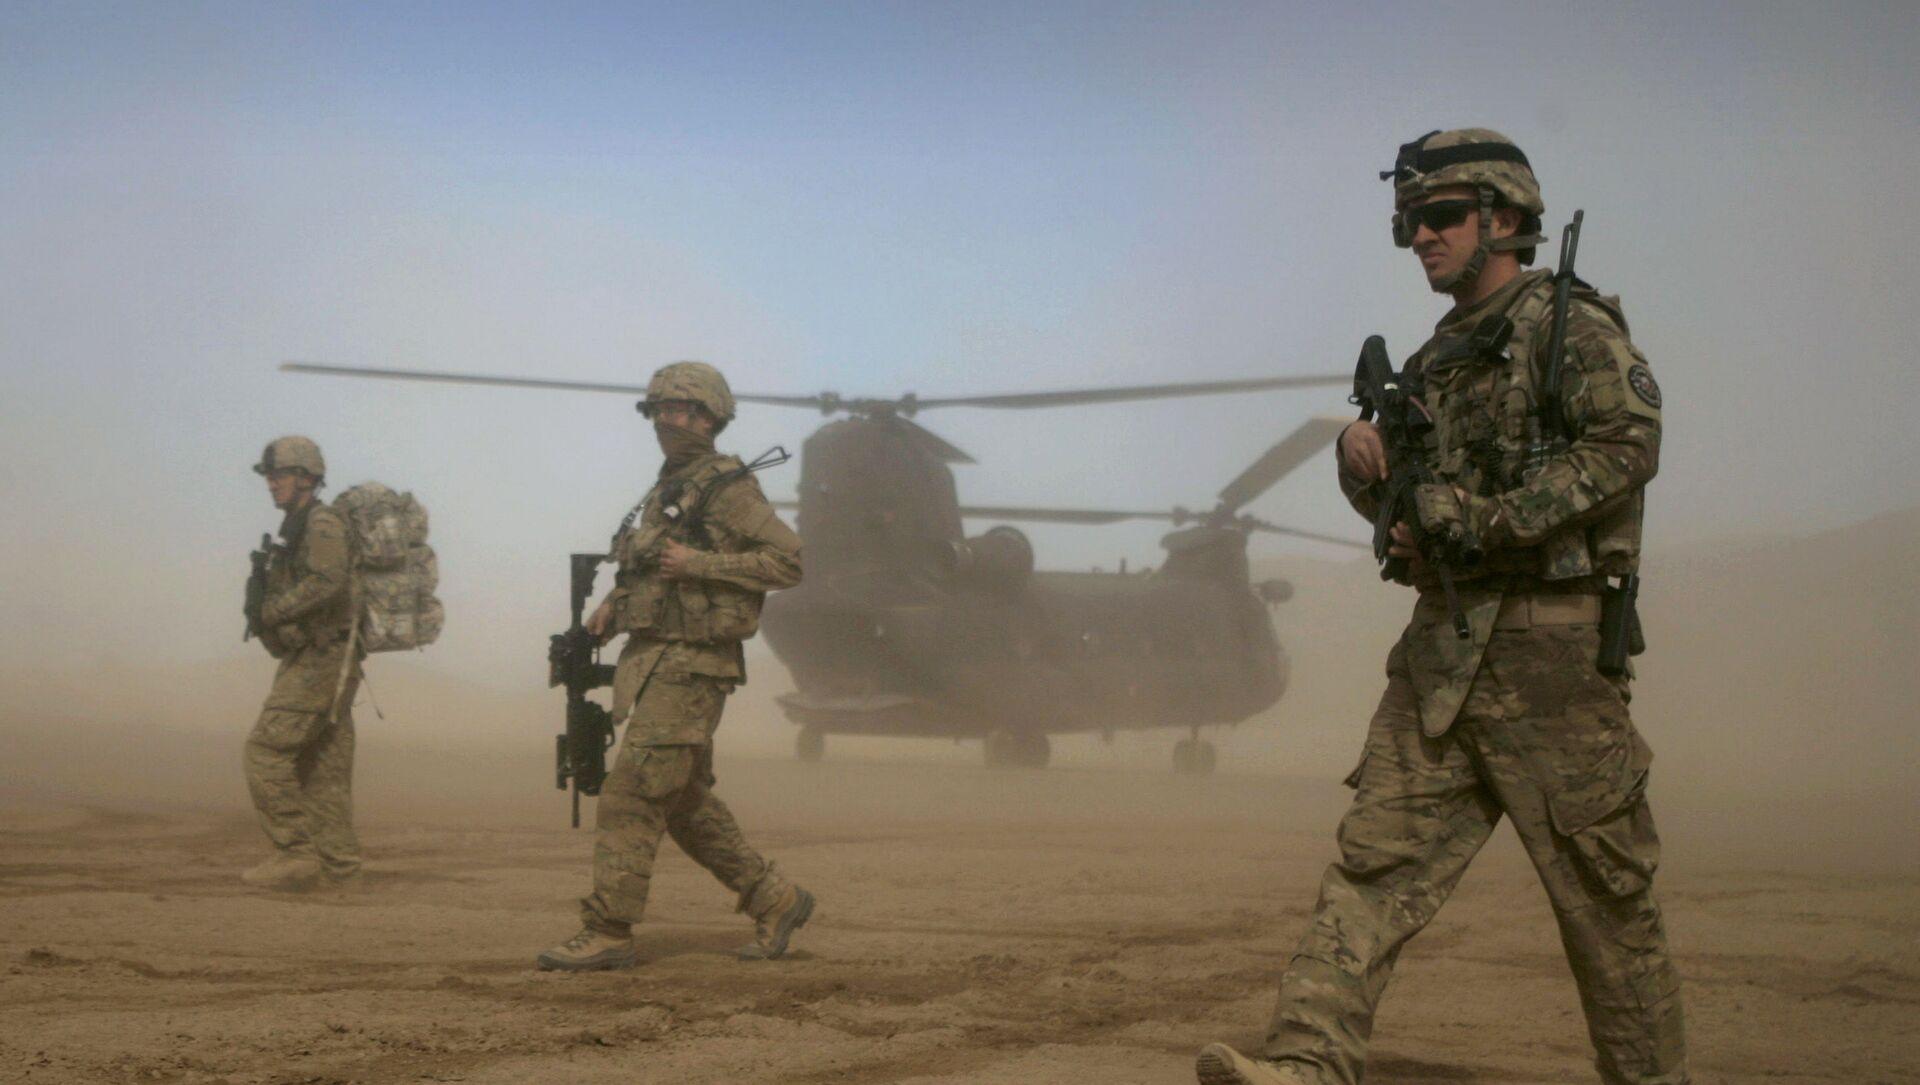 Militari Usa in Afghanistan - Sputnik Italia, 1920, 27.03.2021